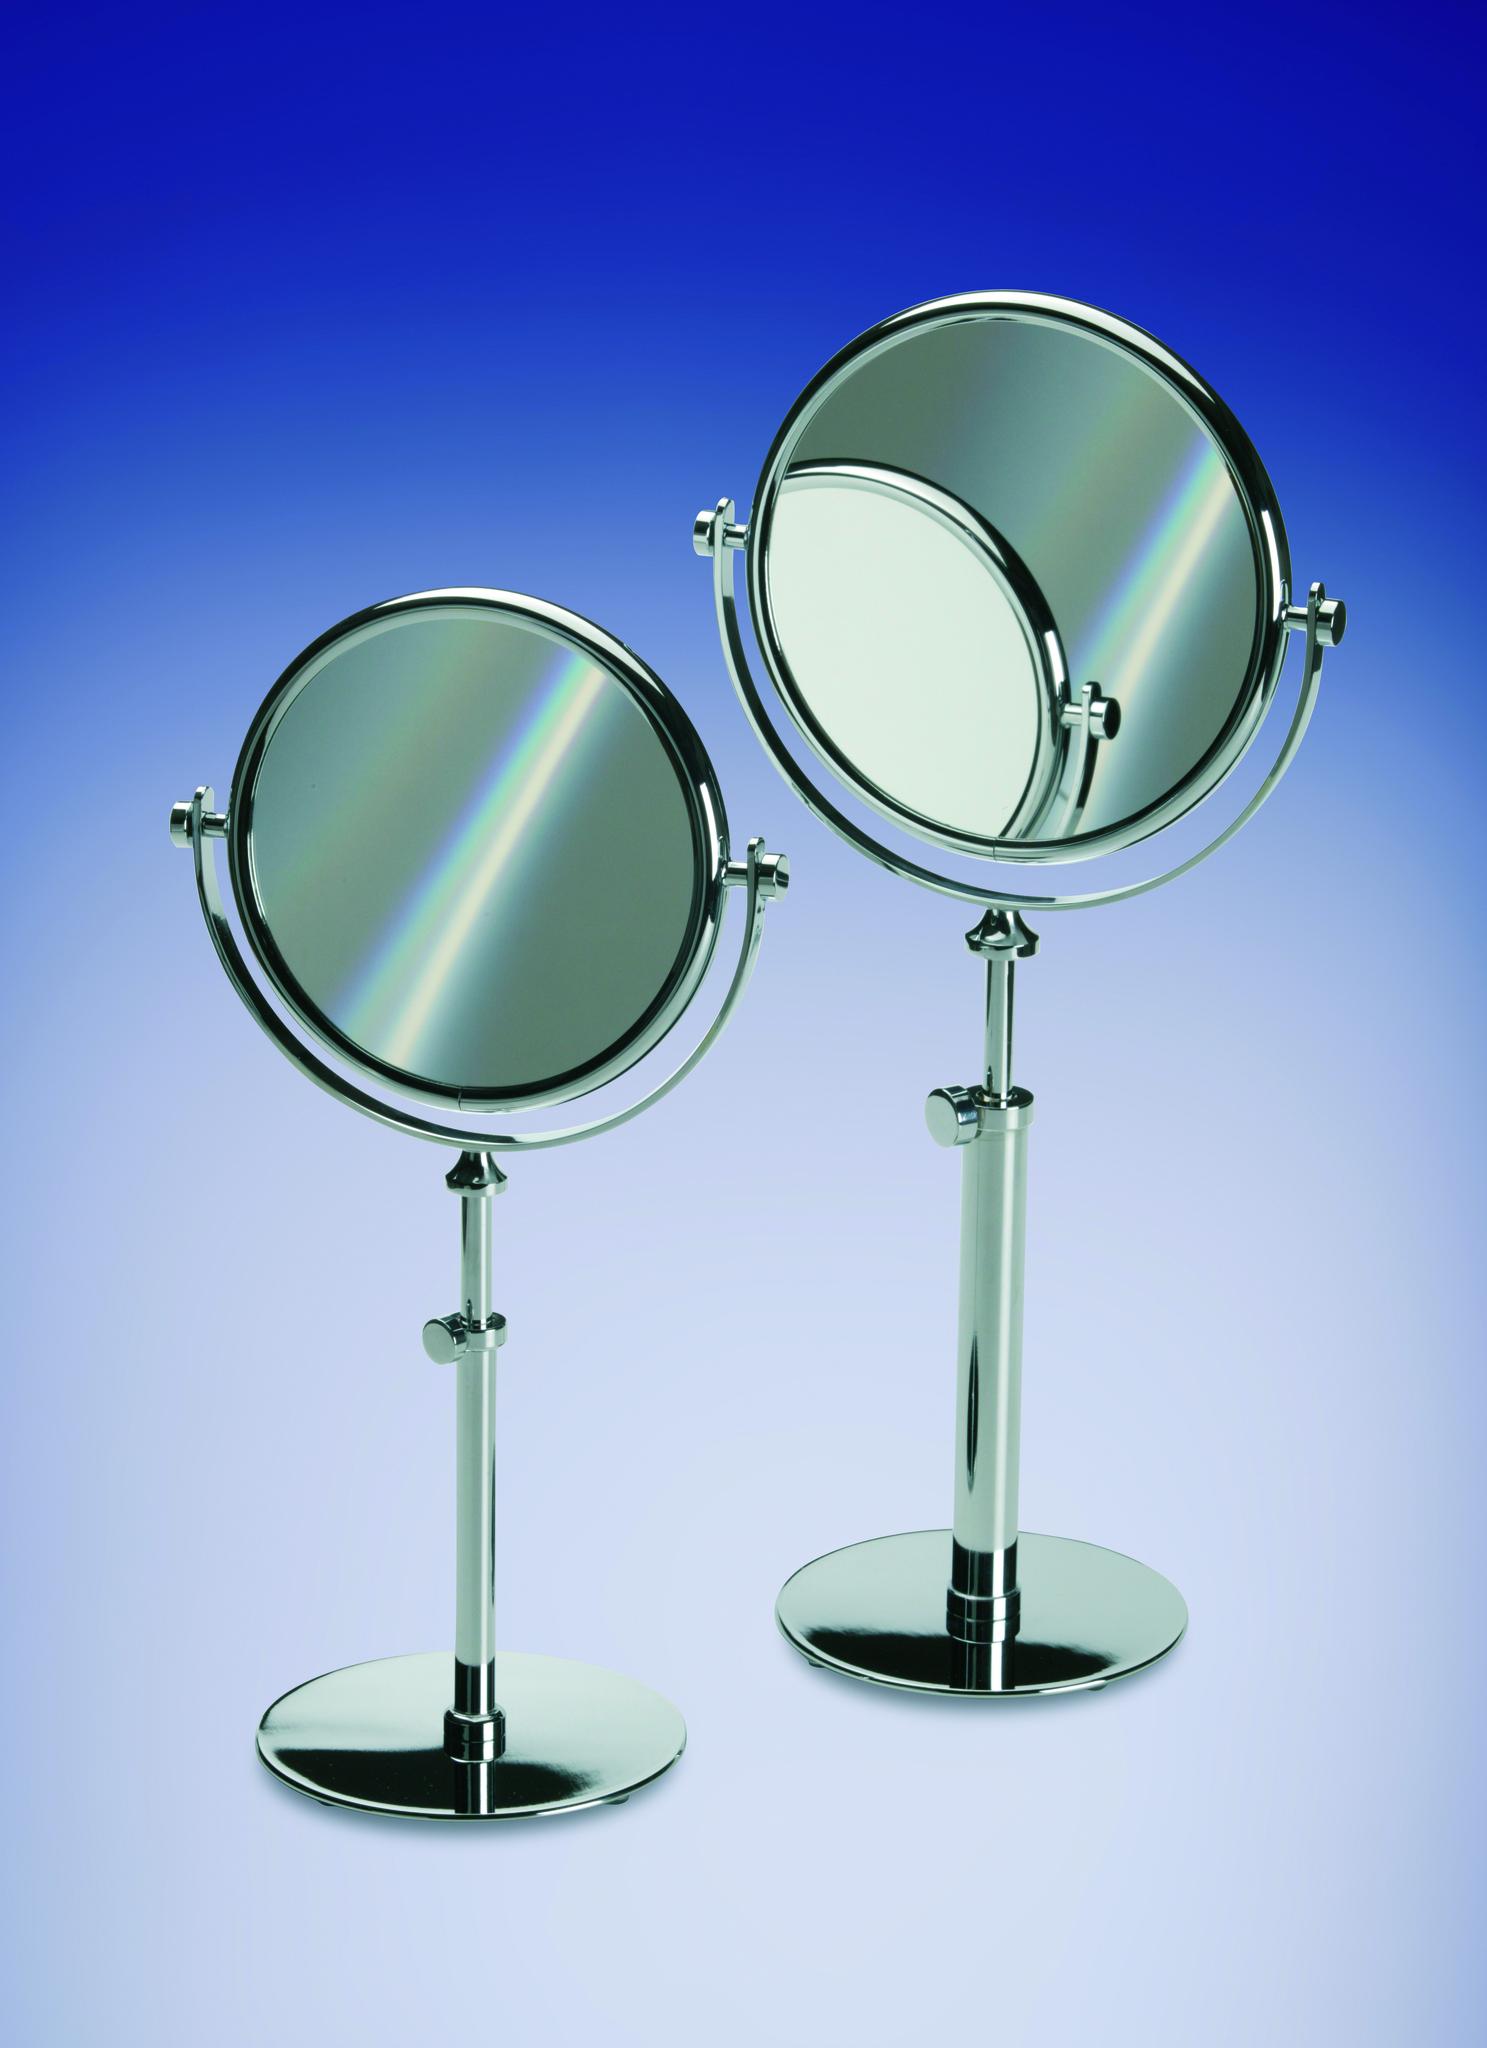 Зеркала Элитное зеркало косметическое 99131CR 5X Plain Crystal от Windisch elitnoe-zerkalo-kosmeticheskoe-99131-plain-crystal-ot-windisch-ispaniya.jpg